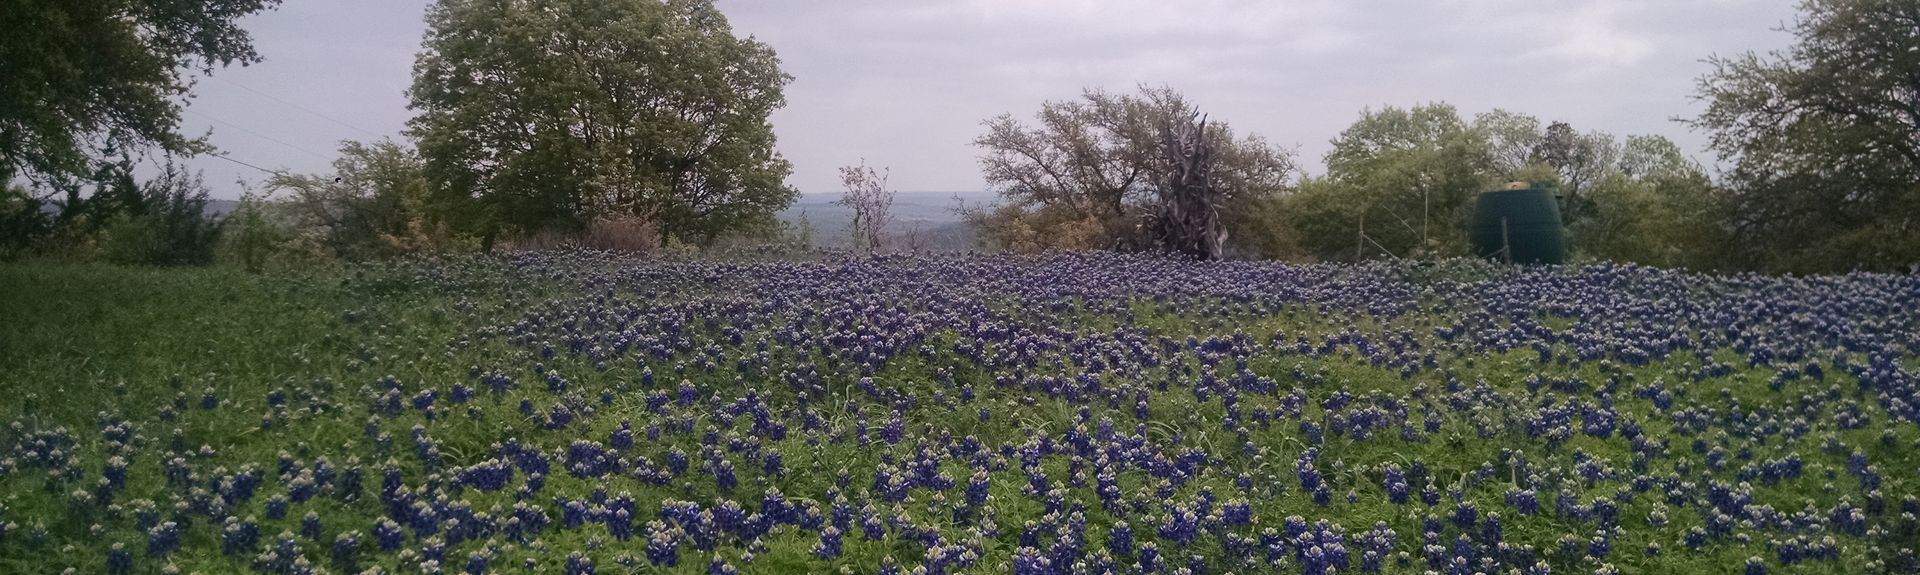 Blanco, Texas, Vereinigte Staaten